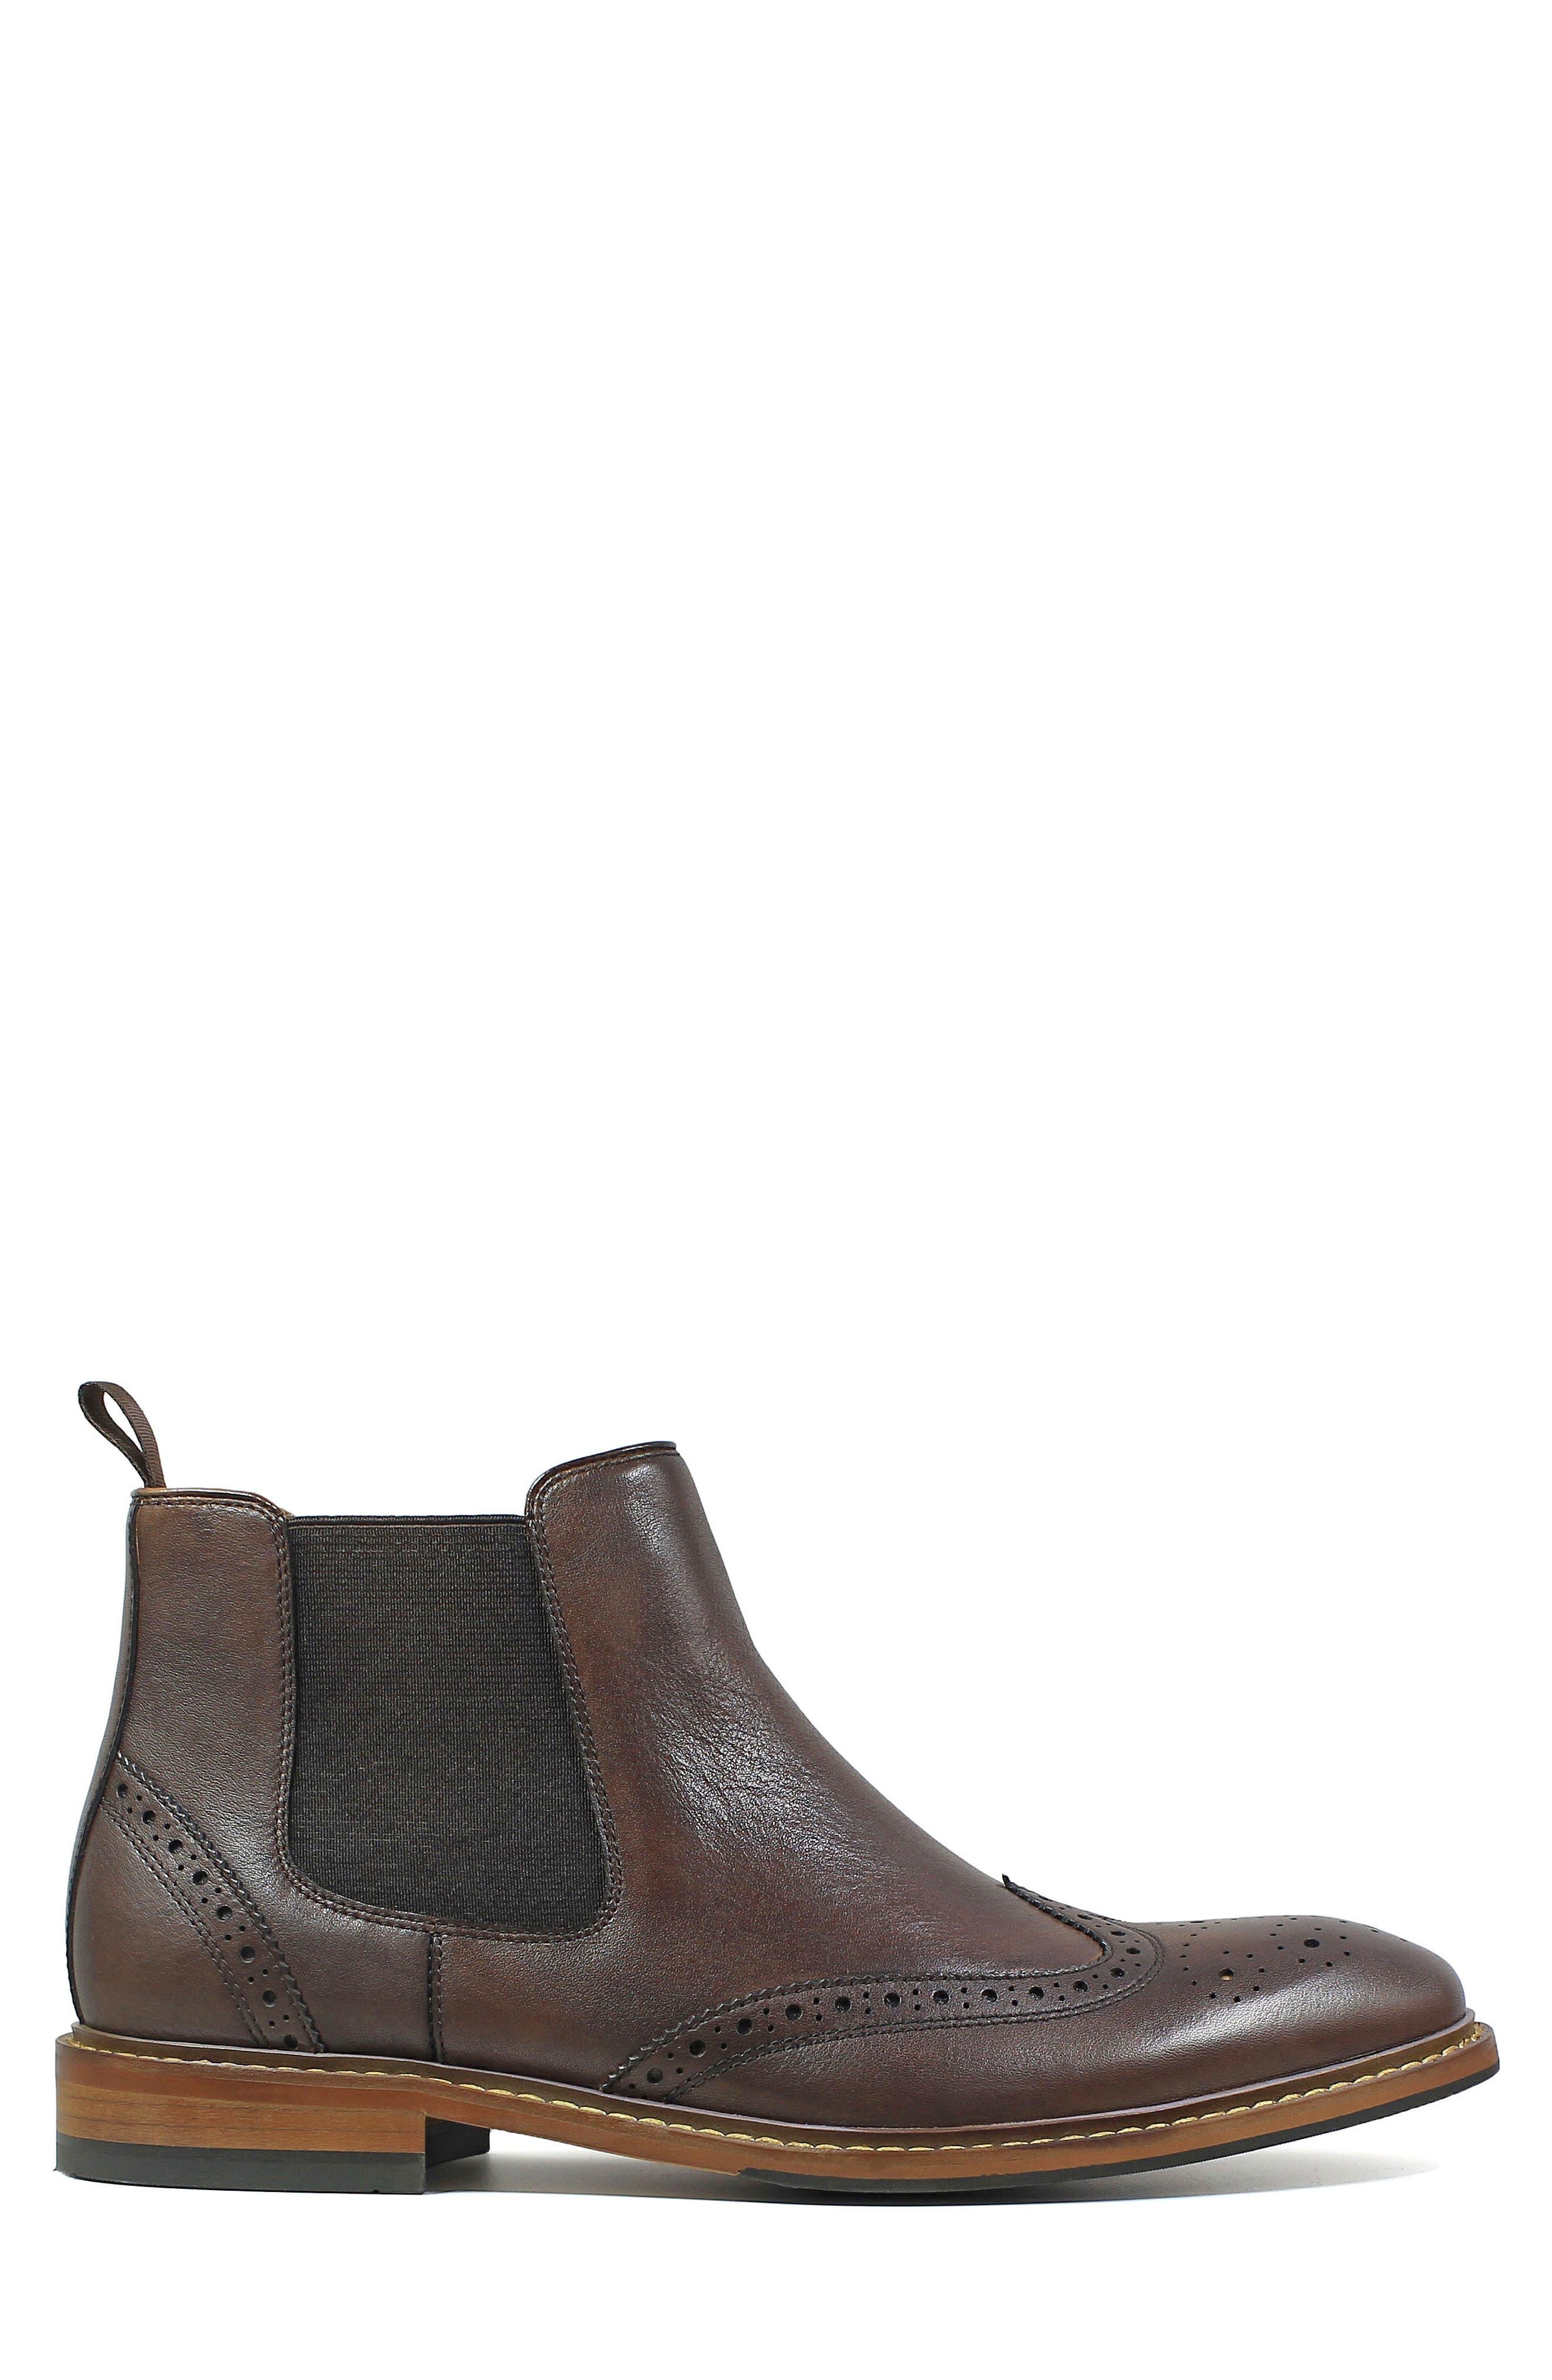 Alternate Image 3  - Florsheim Sheffield Chelsea Boot (Men)